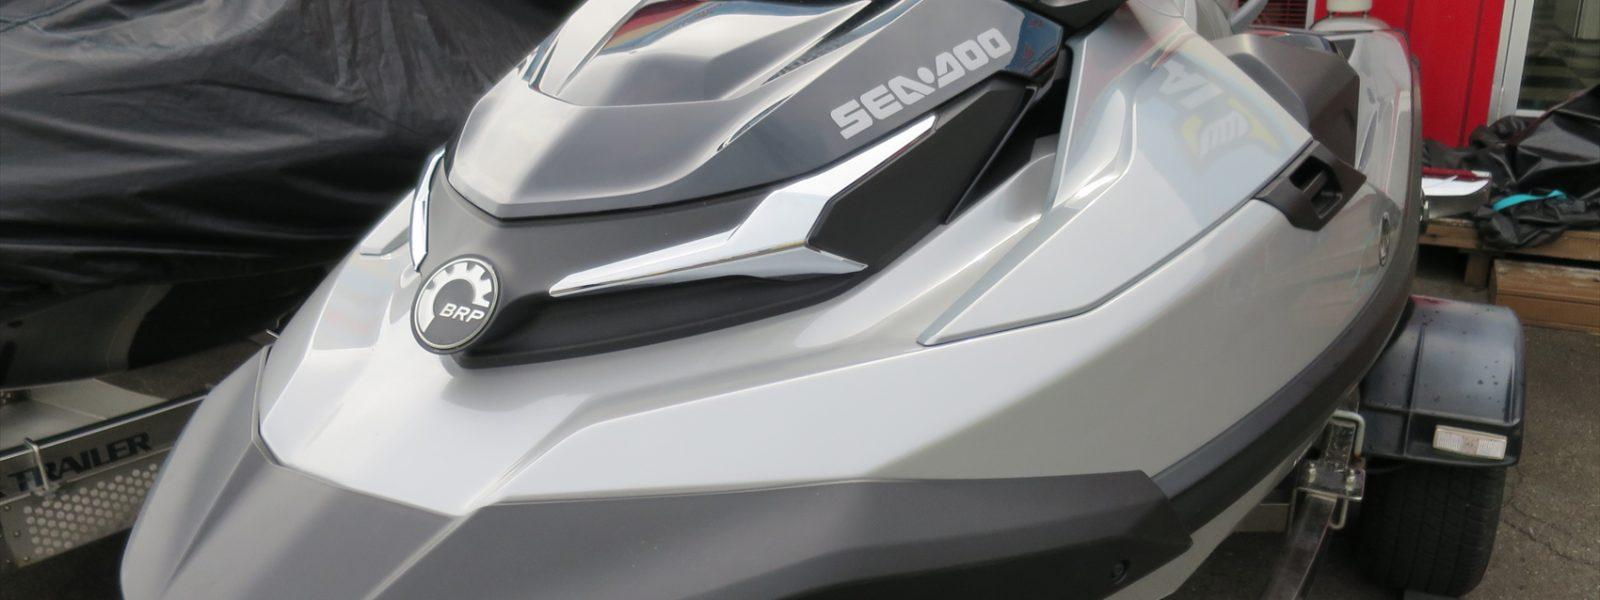 SEADOO GTX Limited300 & RXT-X300 メンテナンス!